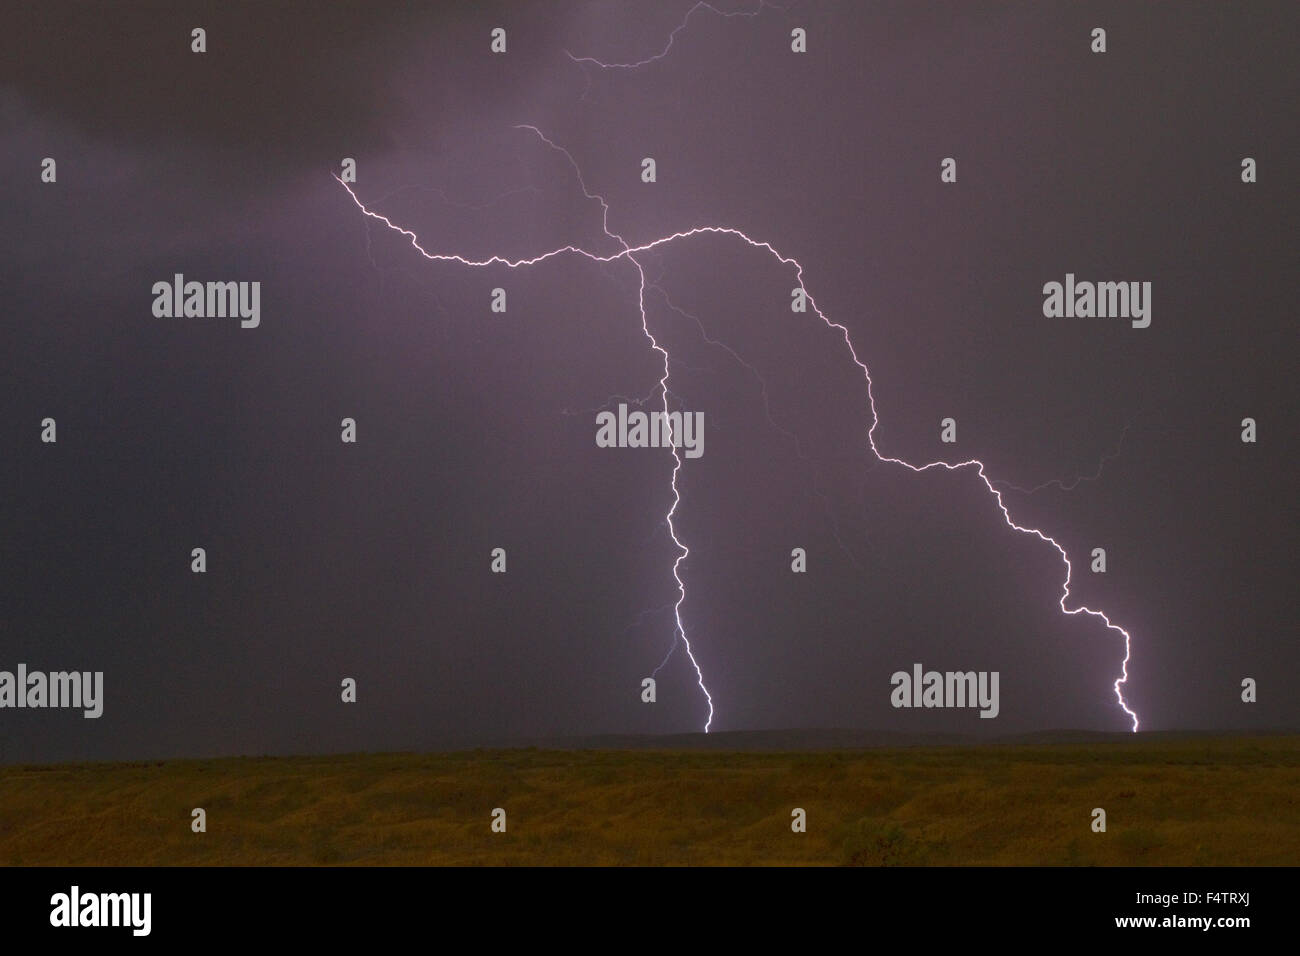 A Destructive Evening Freak Storm In Penang: Electrical Storm Stock Photos & Electrical Storm Stock